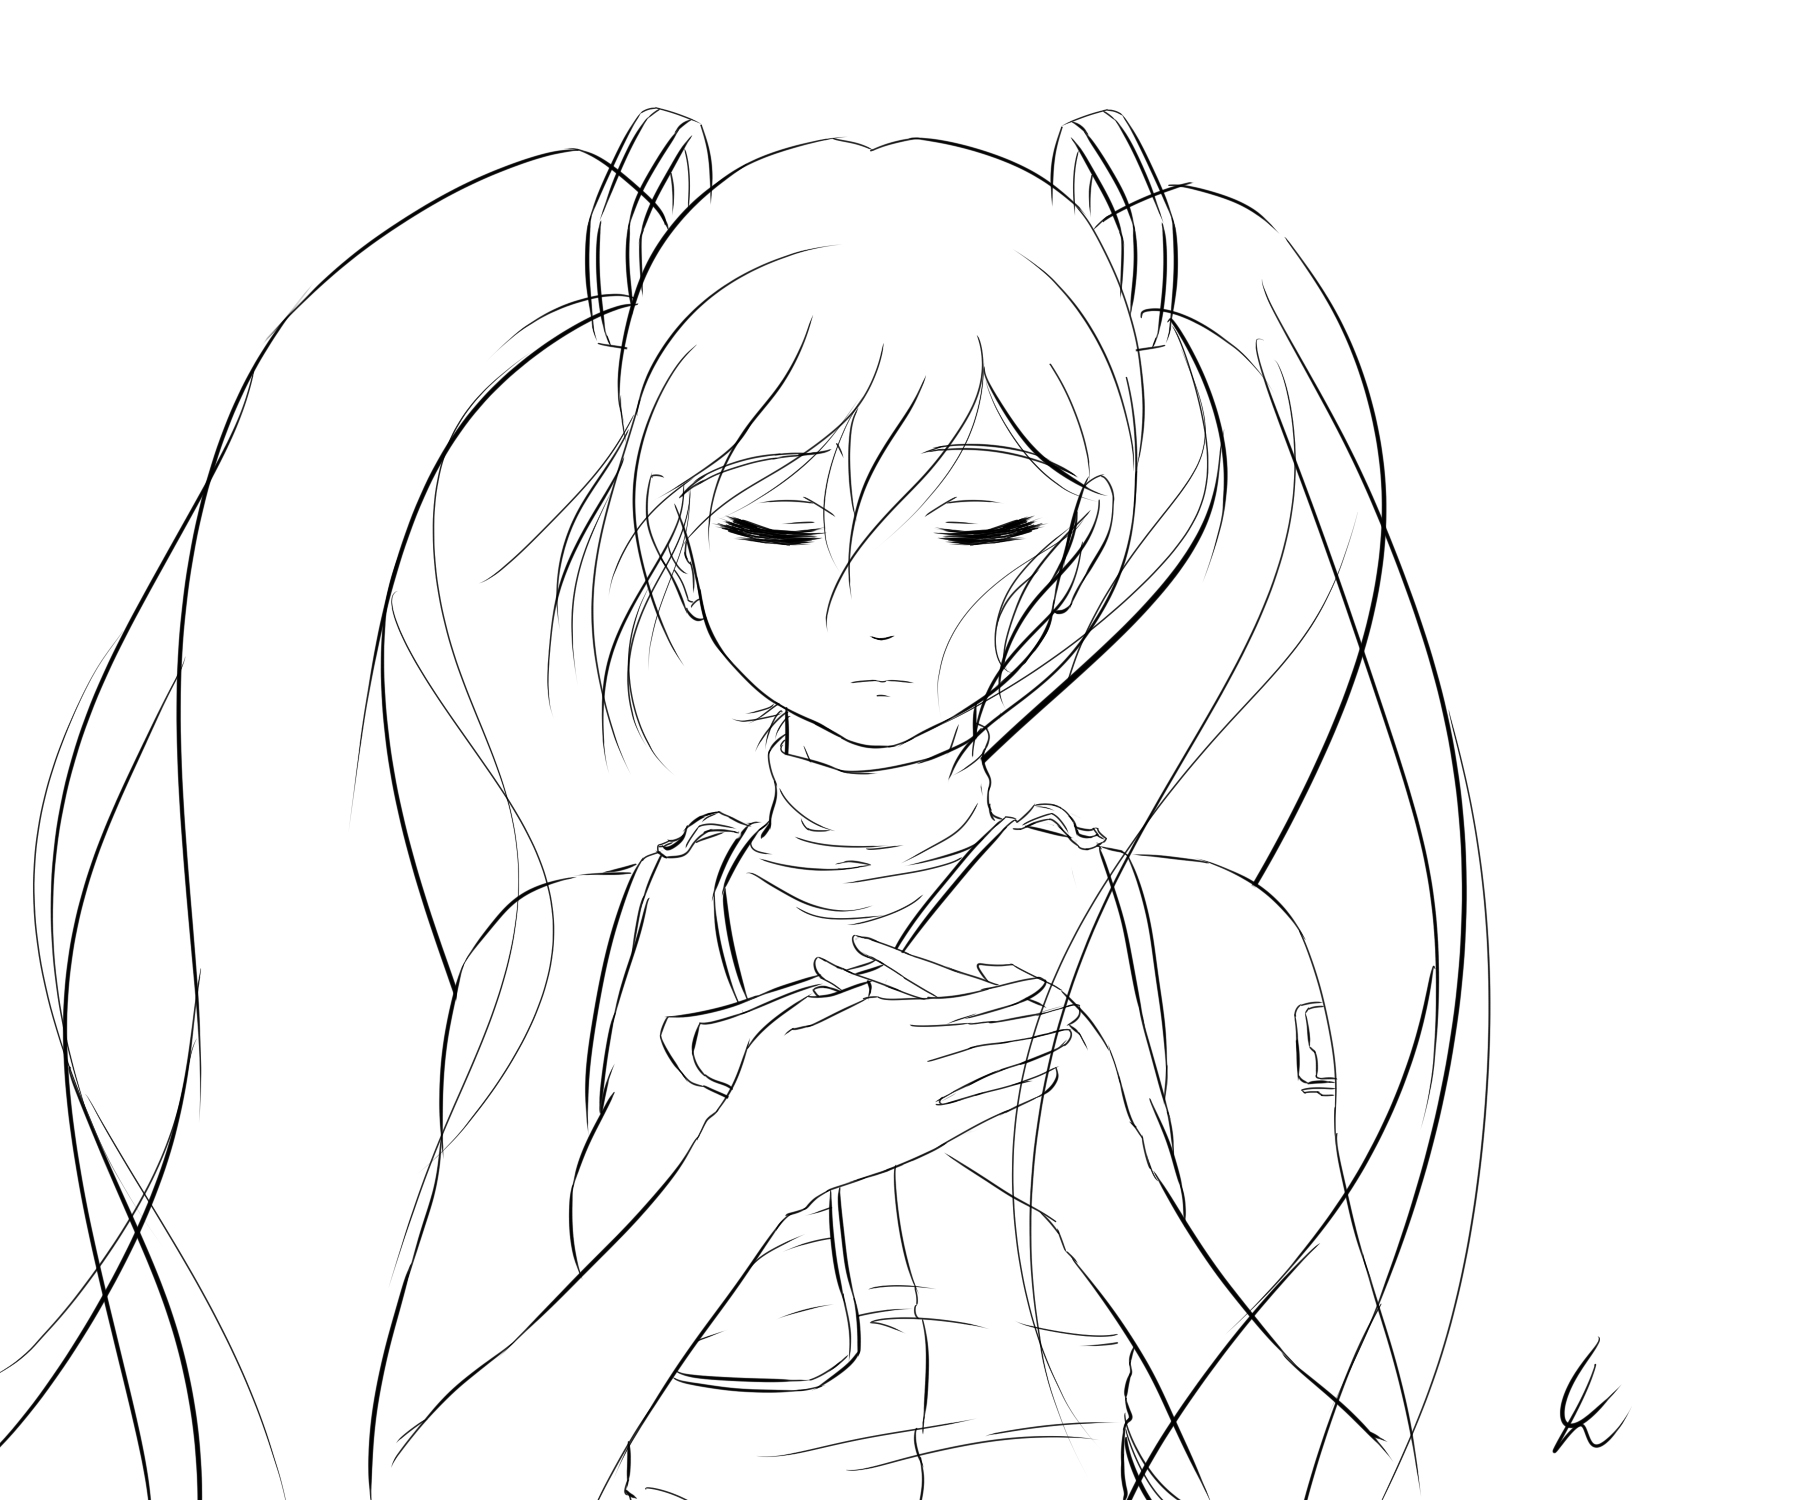 Hatsune Miku -lineart- by Indignation on DeviantArt